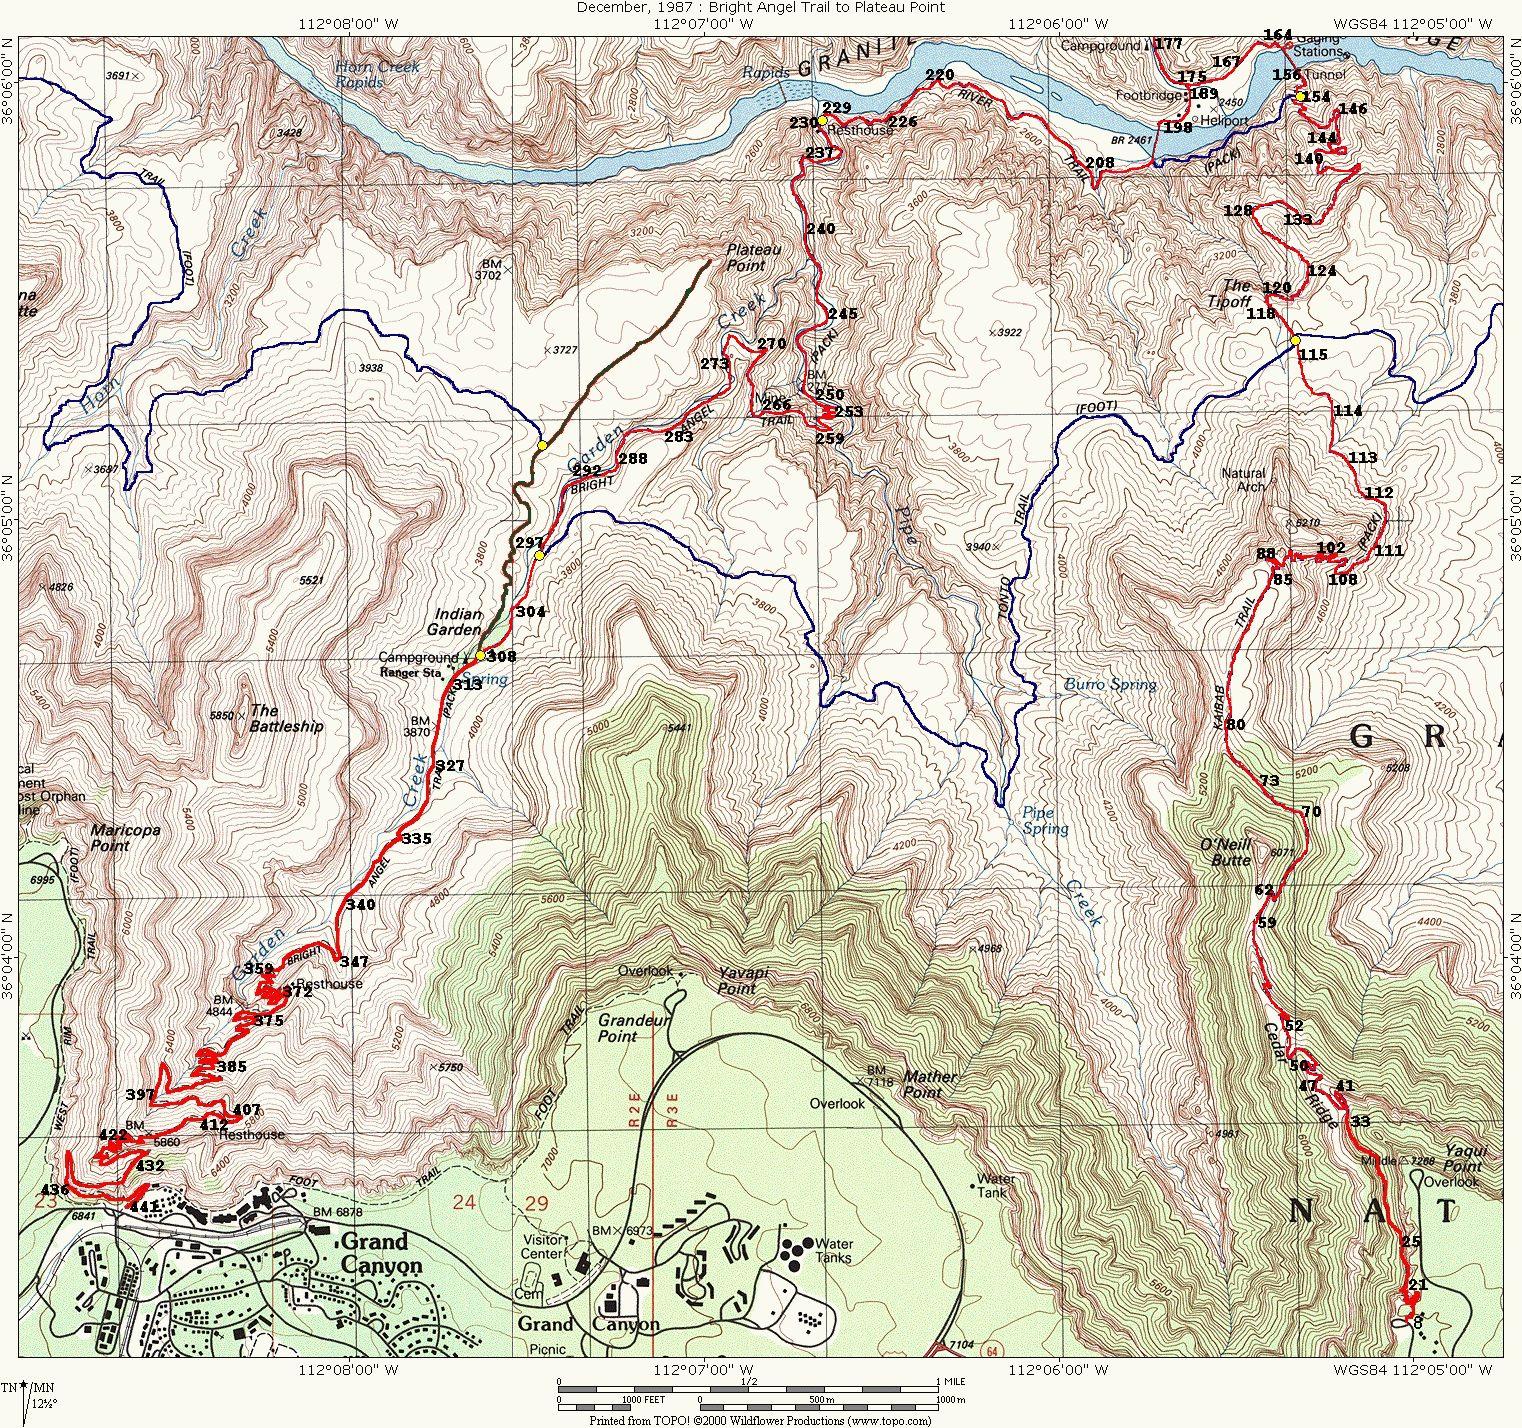 Grand Canyon Virtual Hike